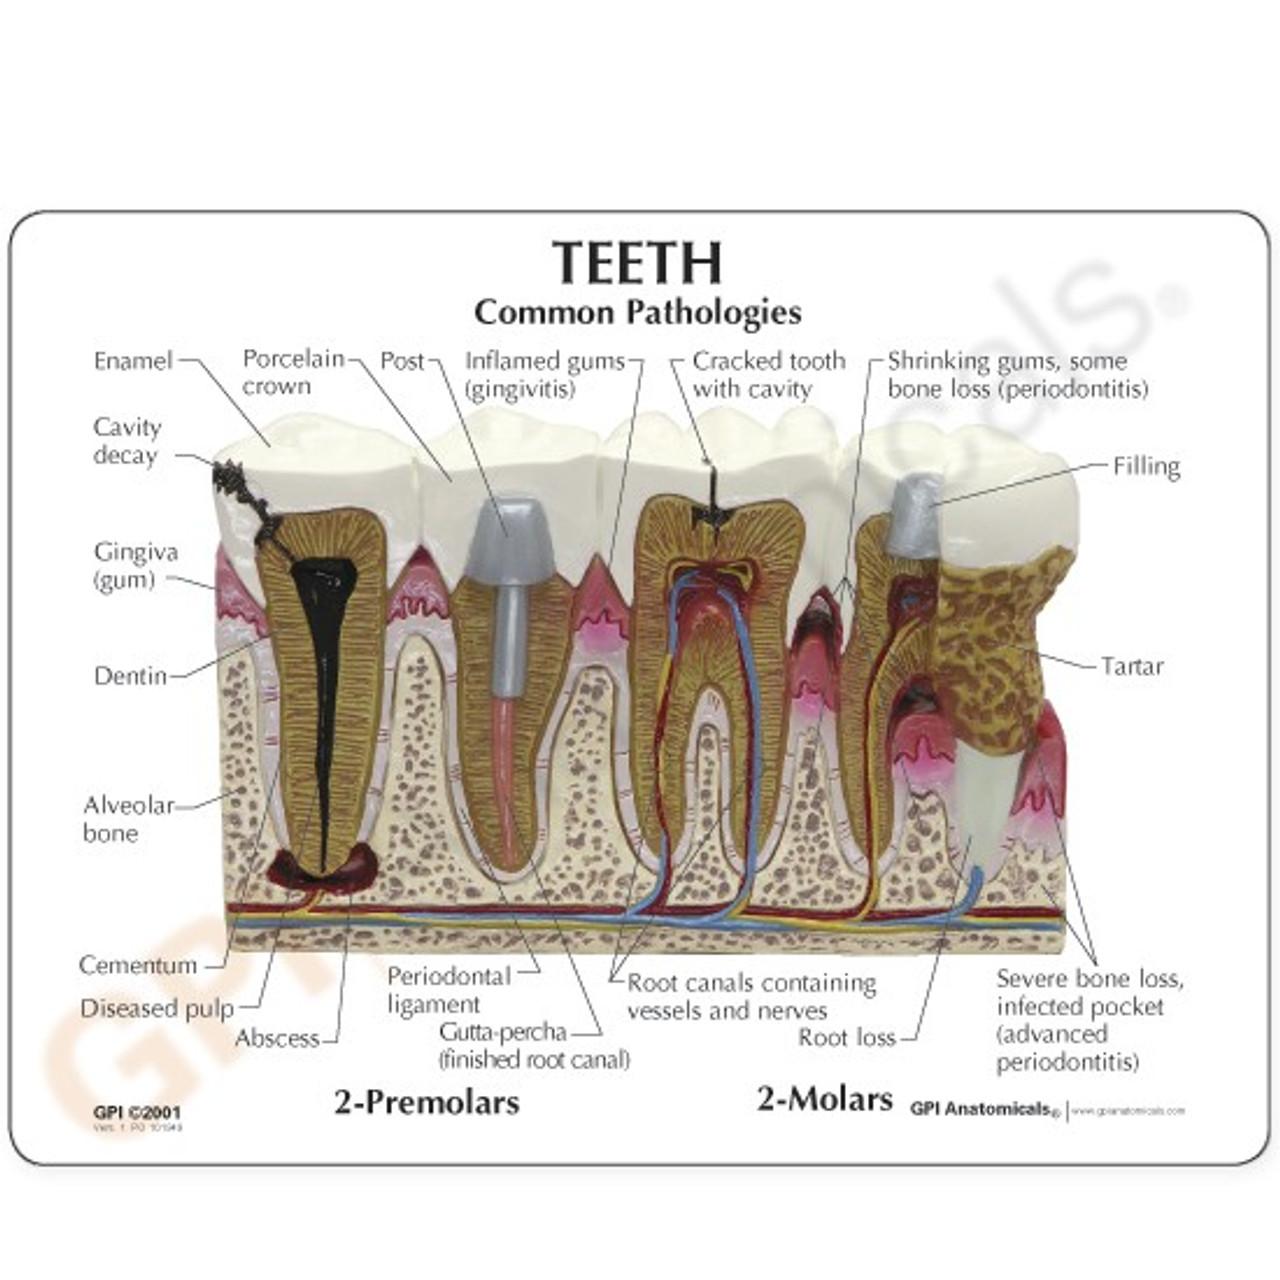 Teeth Dental Model description Card